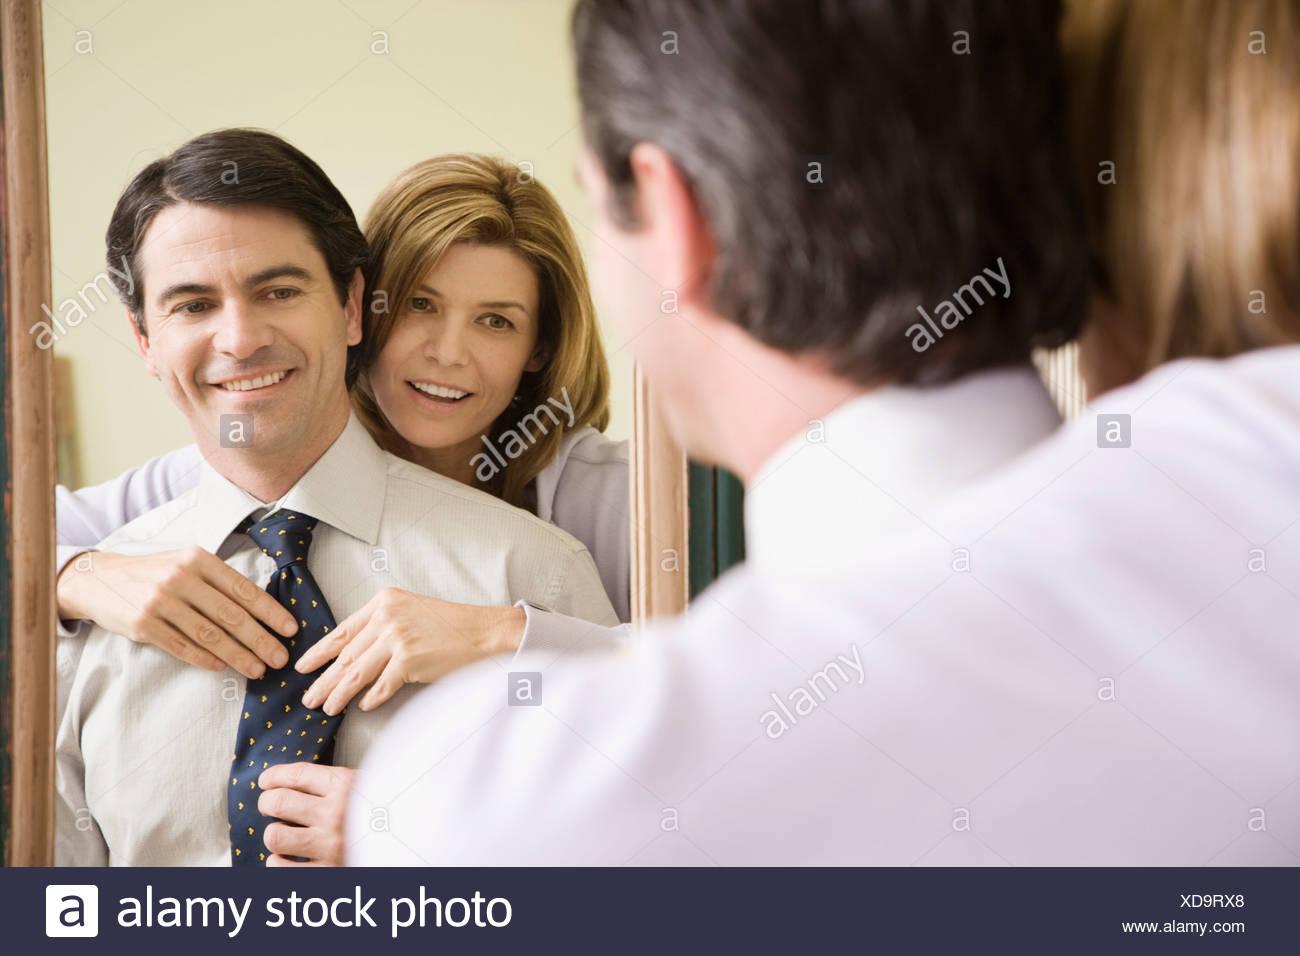 Woman adjusting husband's necktie - Stock Image